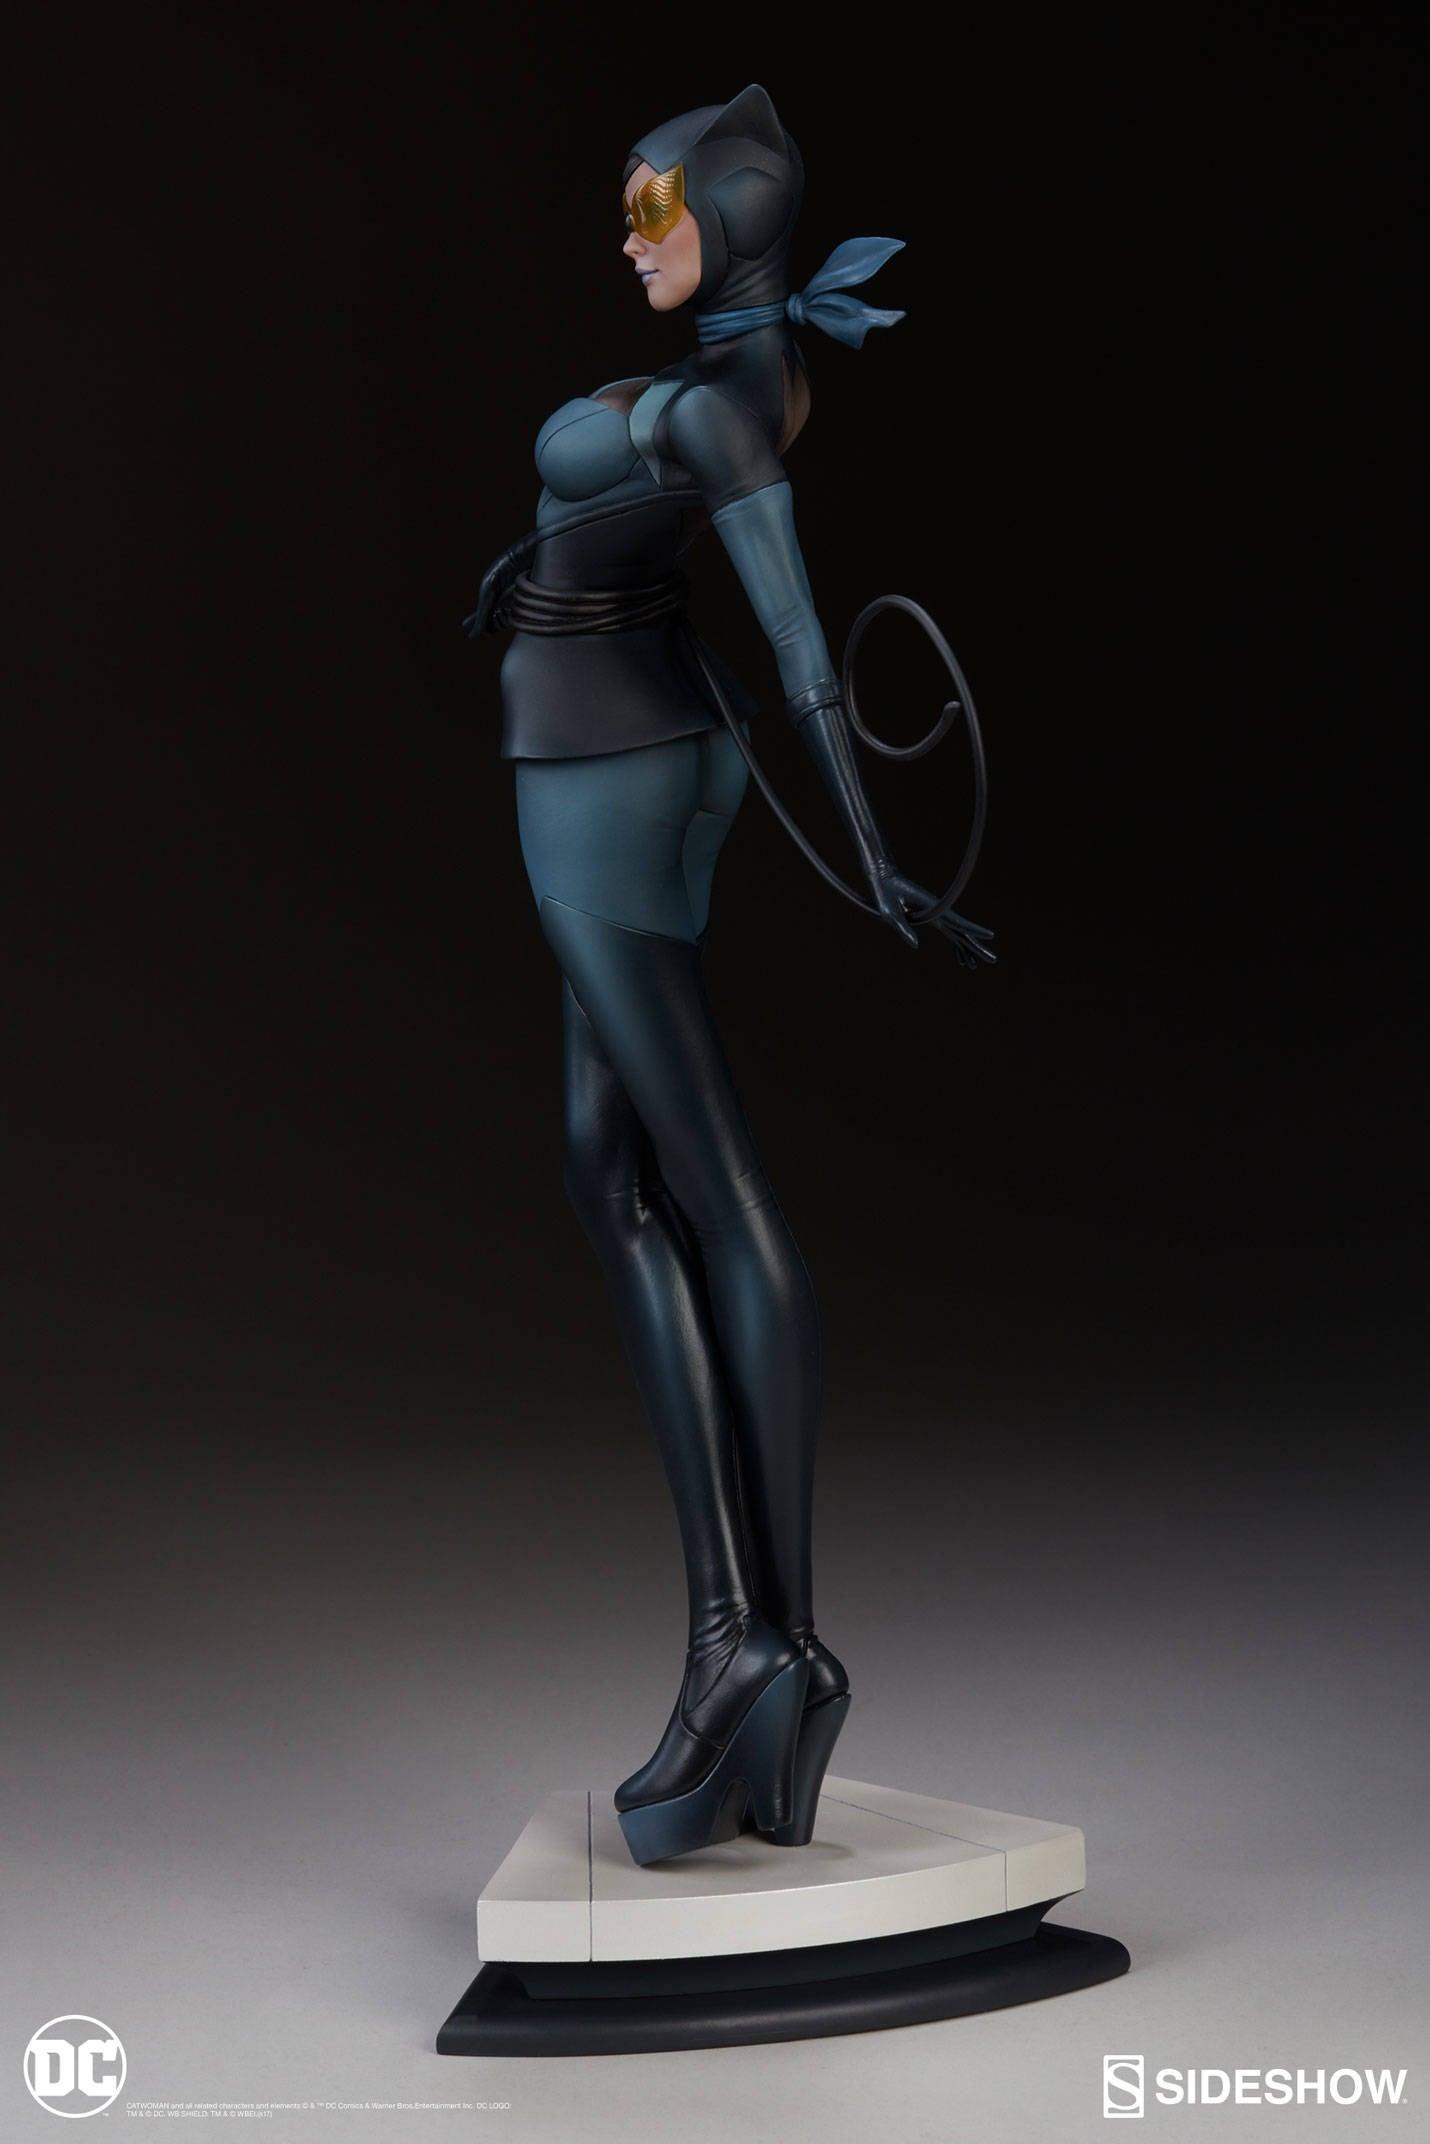 Catwoman-Sideshow-Artgerm-Statue03